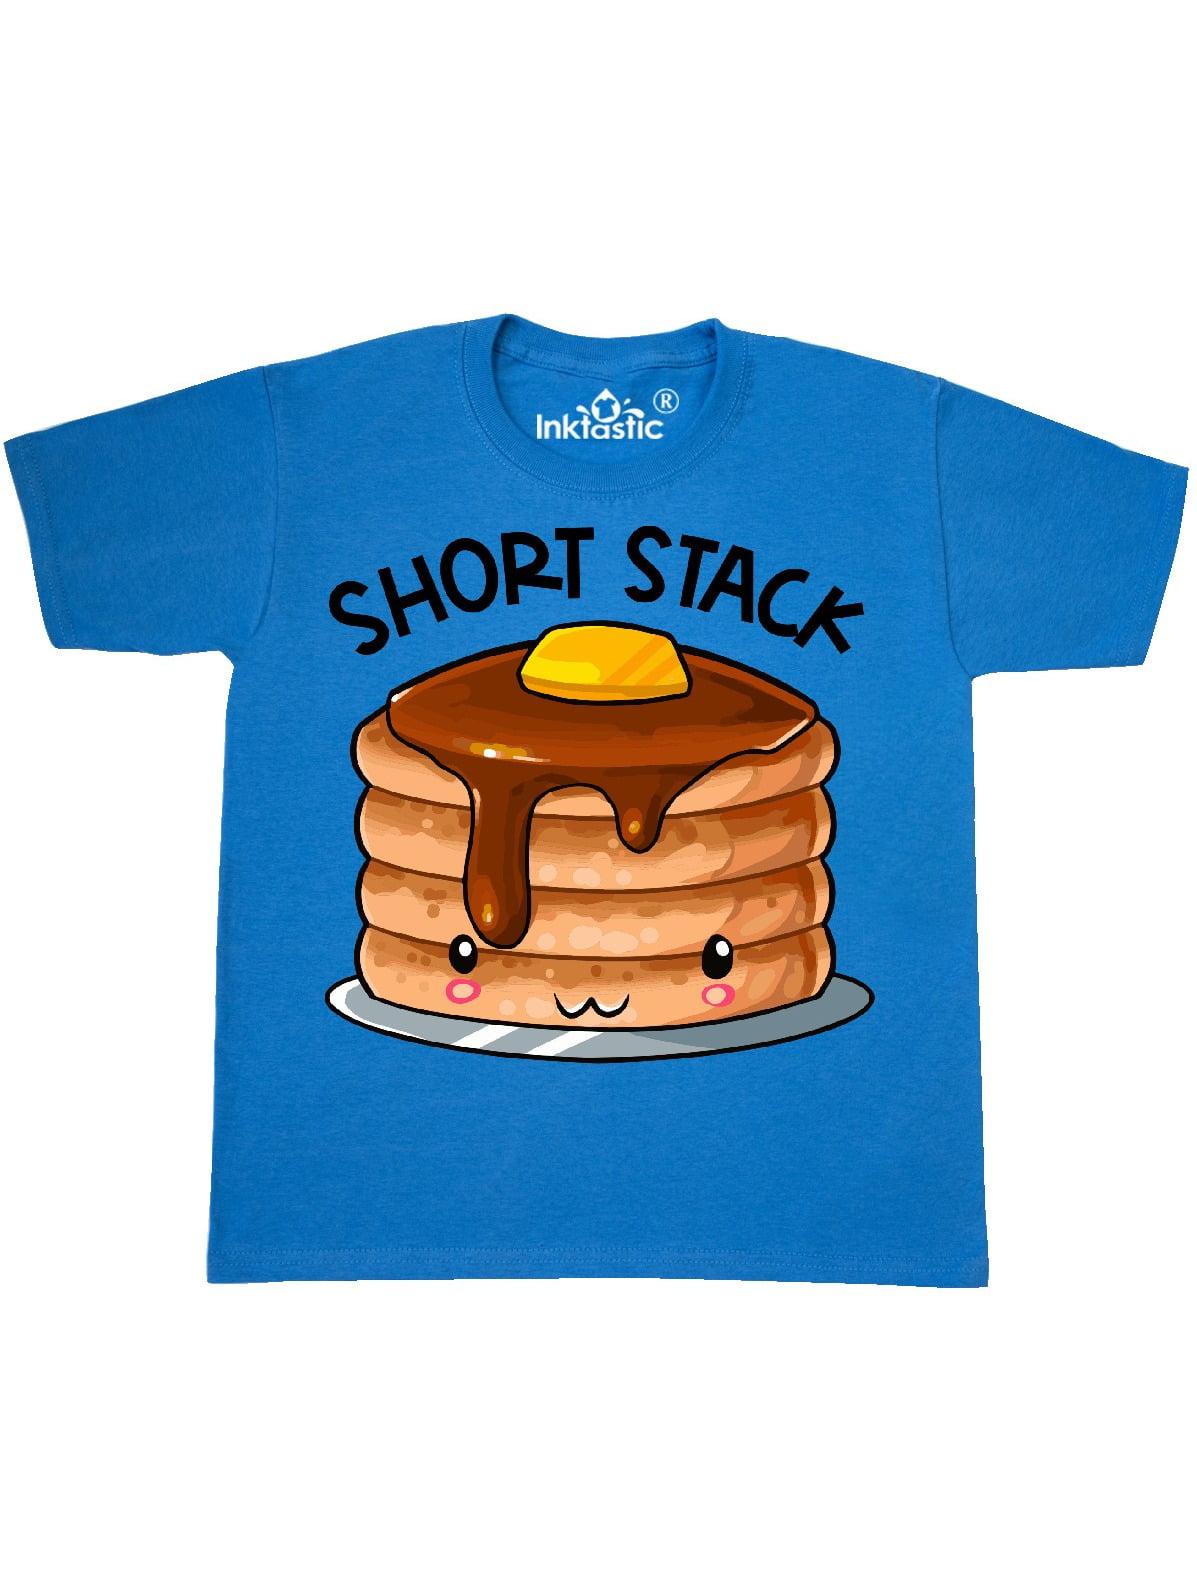 inktastic Short Stack Cute Pancake Breakfast Baby T-Shirt